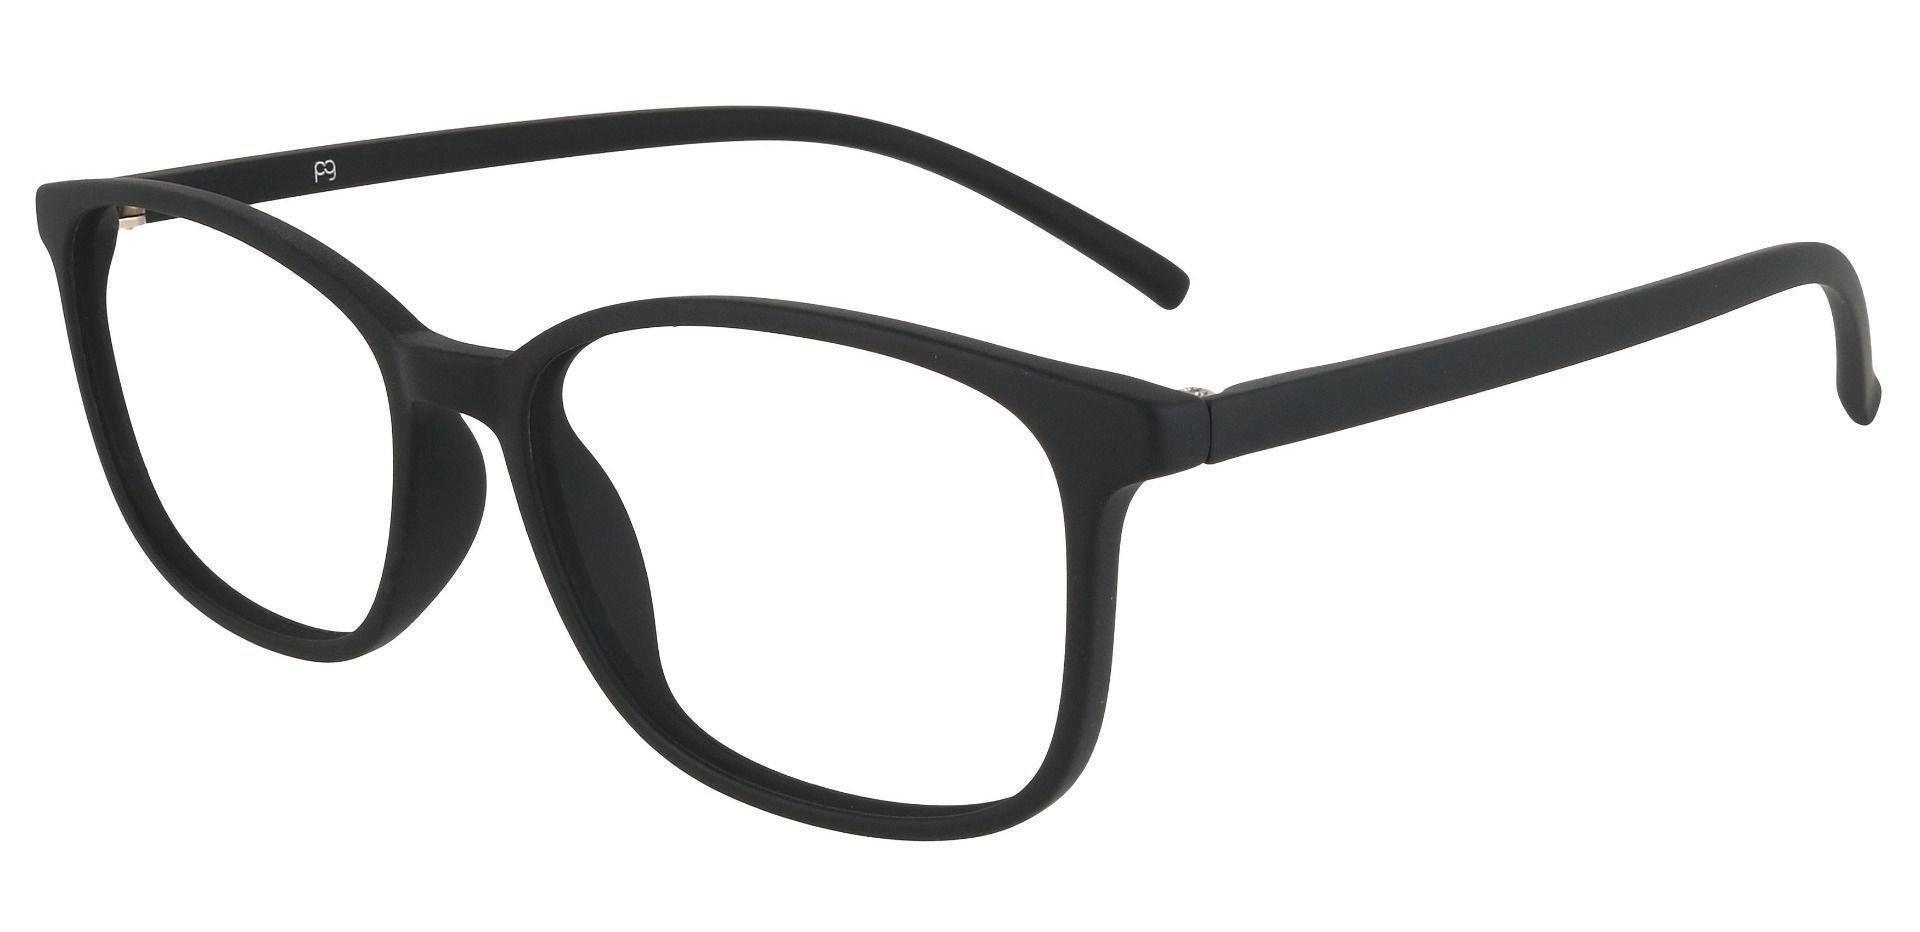 Onyx Square Prescription Glasses - Black